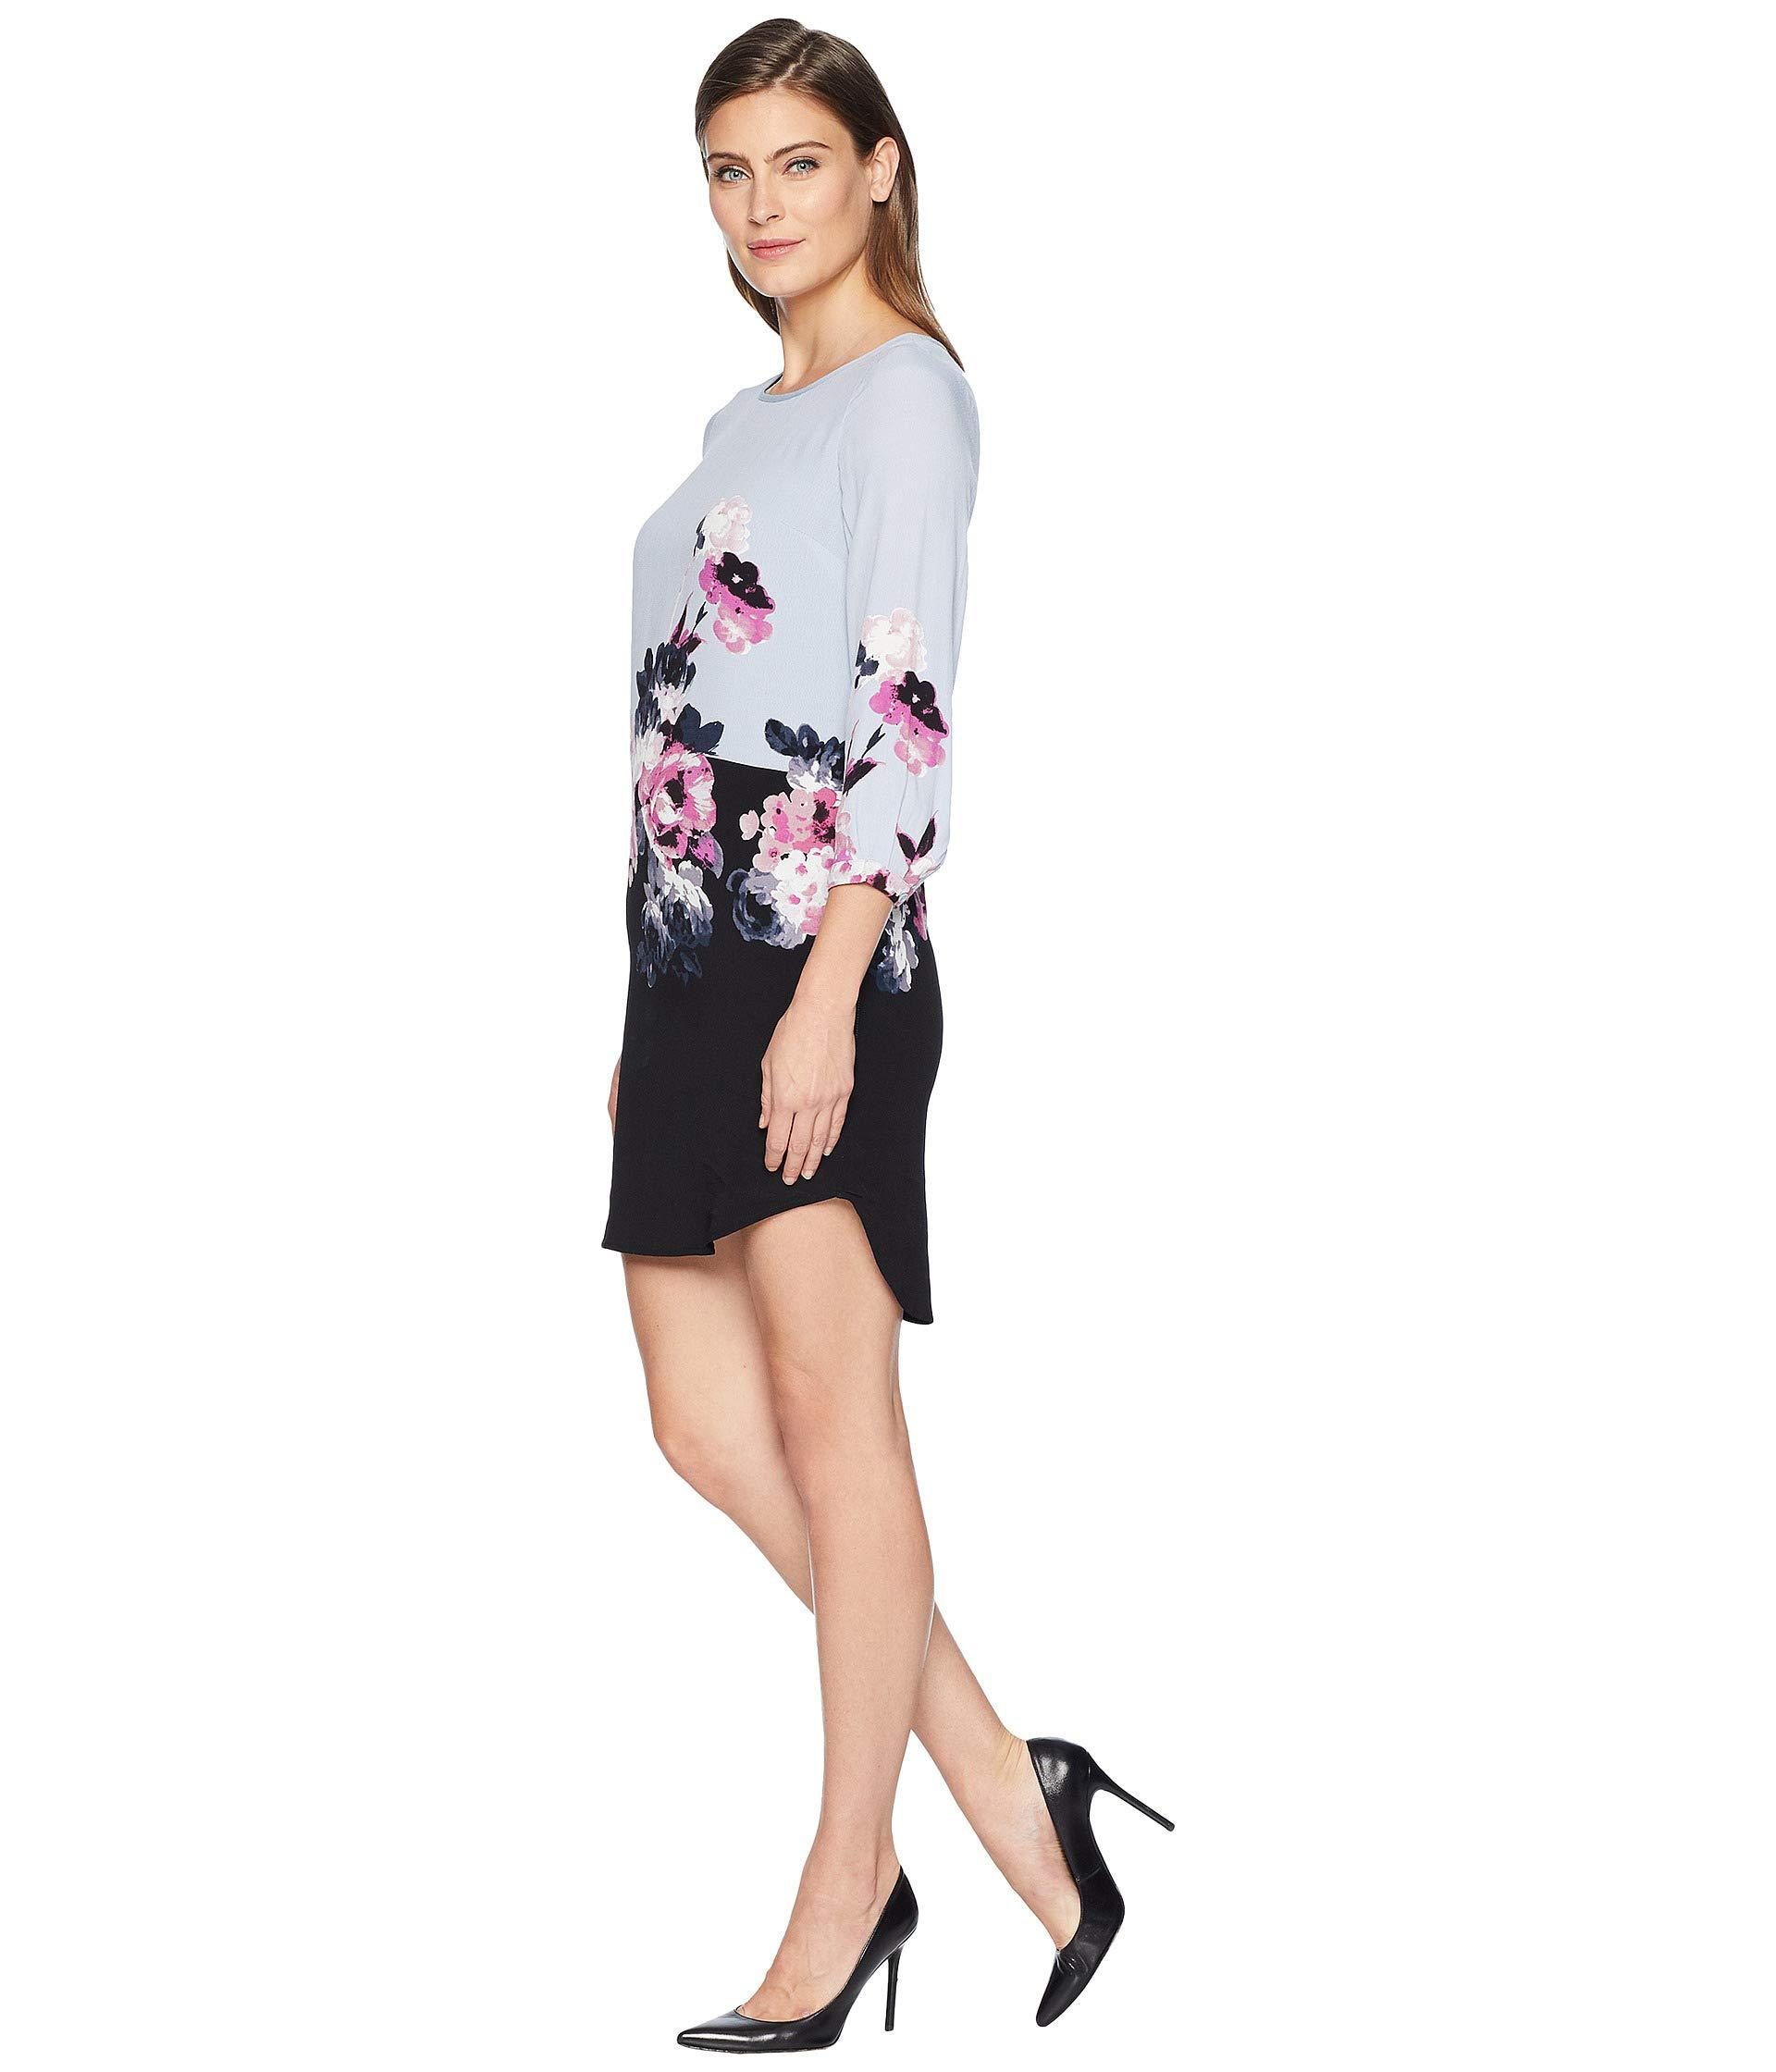 Lyst - Joules Lyris Woven Dress e1c158993